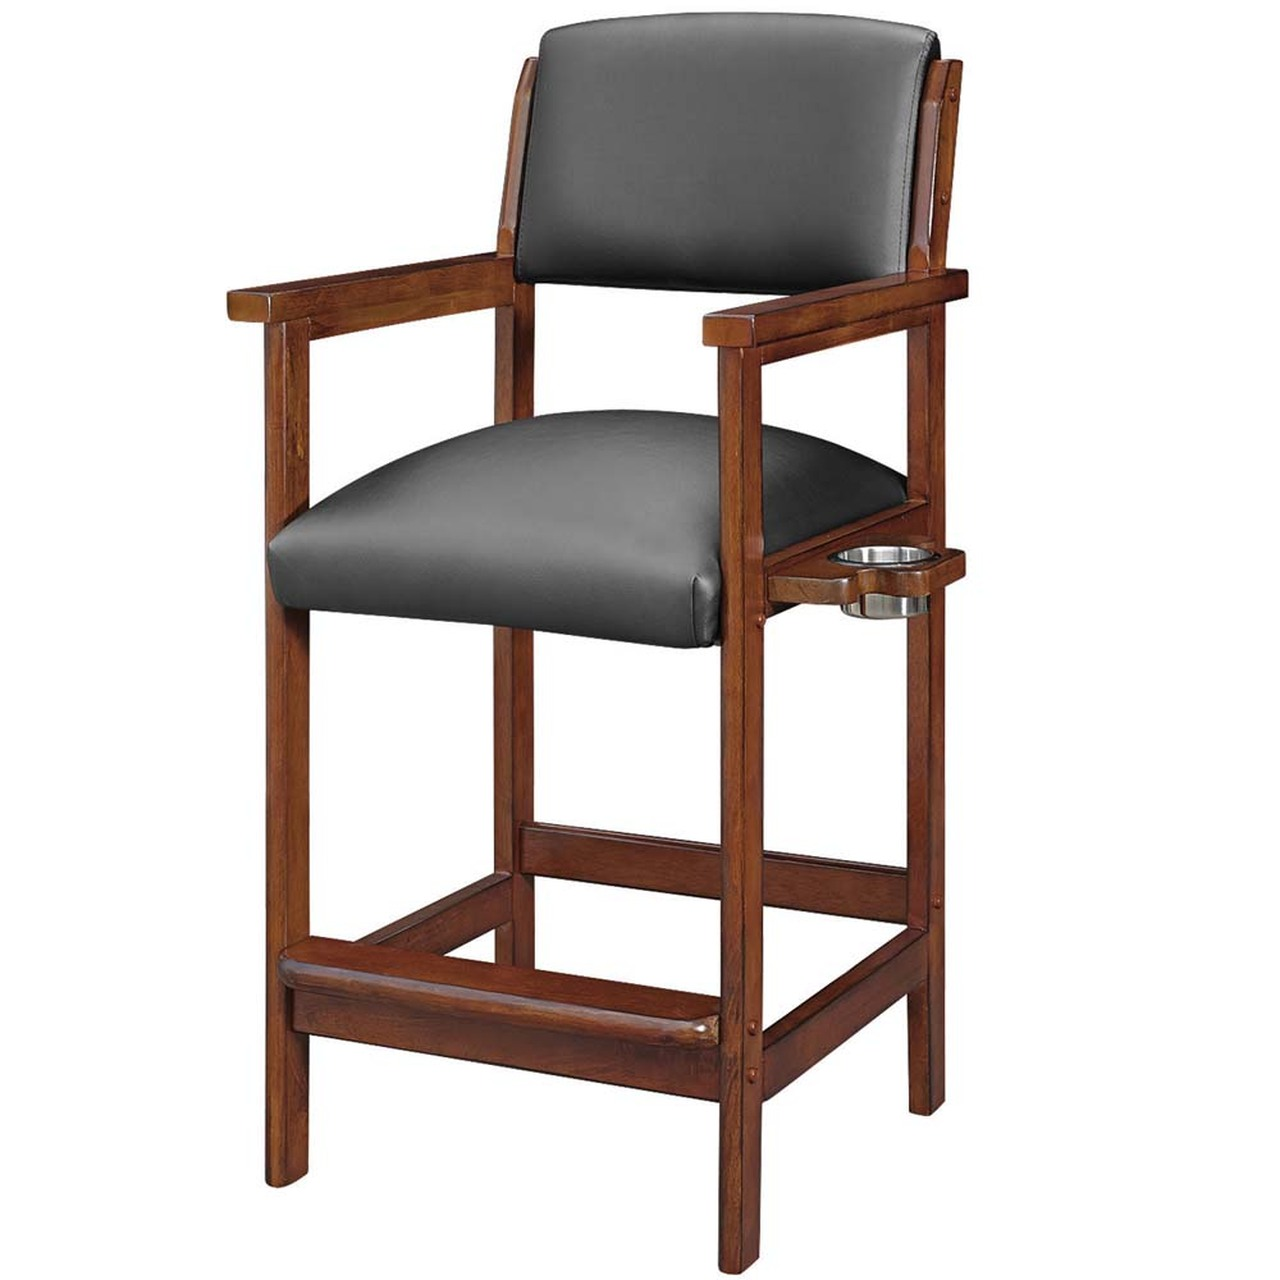 Ram Gameroom Spectator Chair Bar Stool Chestnut